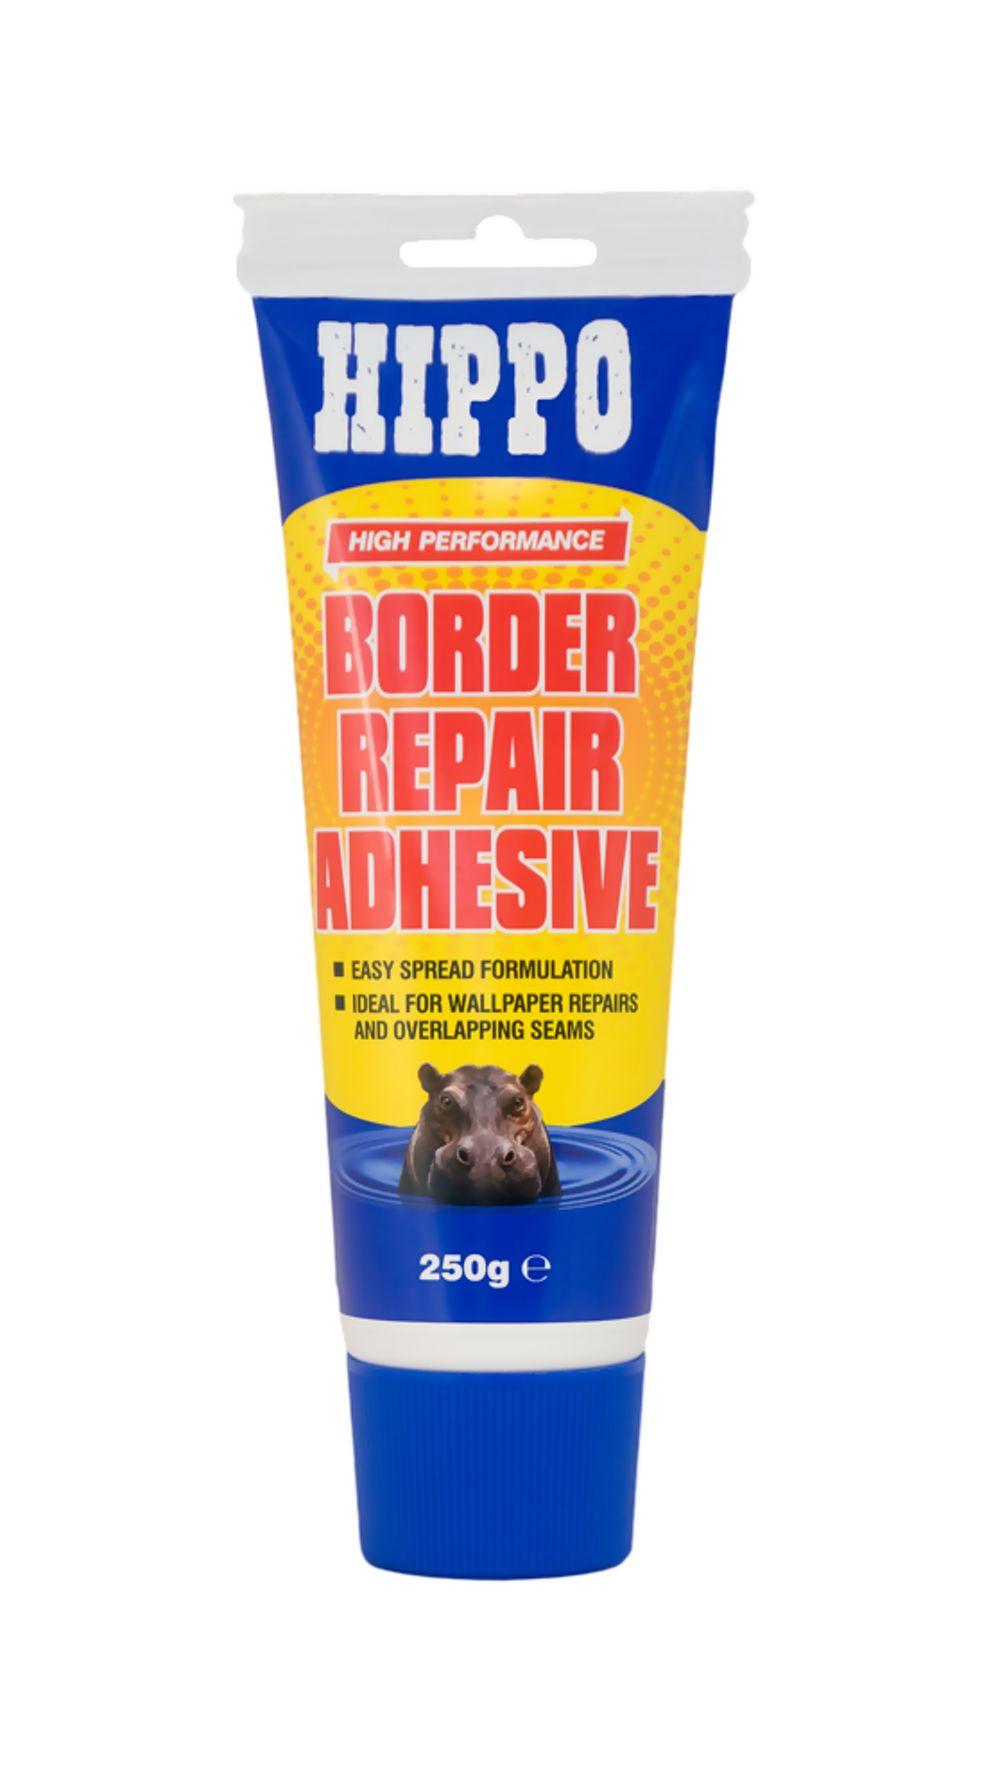 Hippo Overlap & Border Adhesive 250g Tube Ref F18342